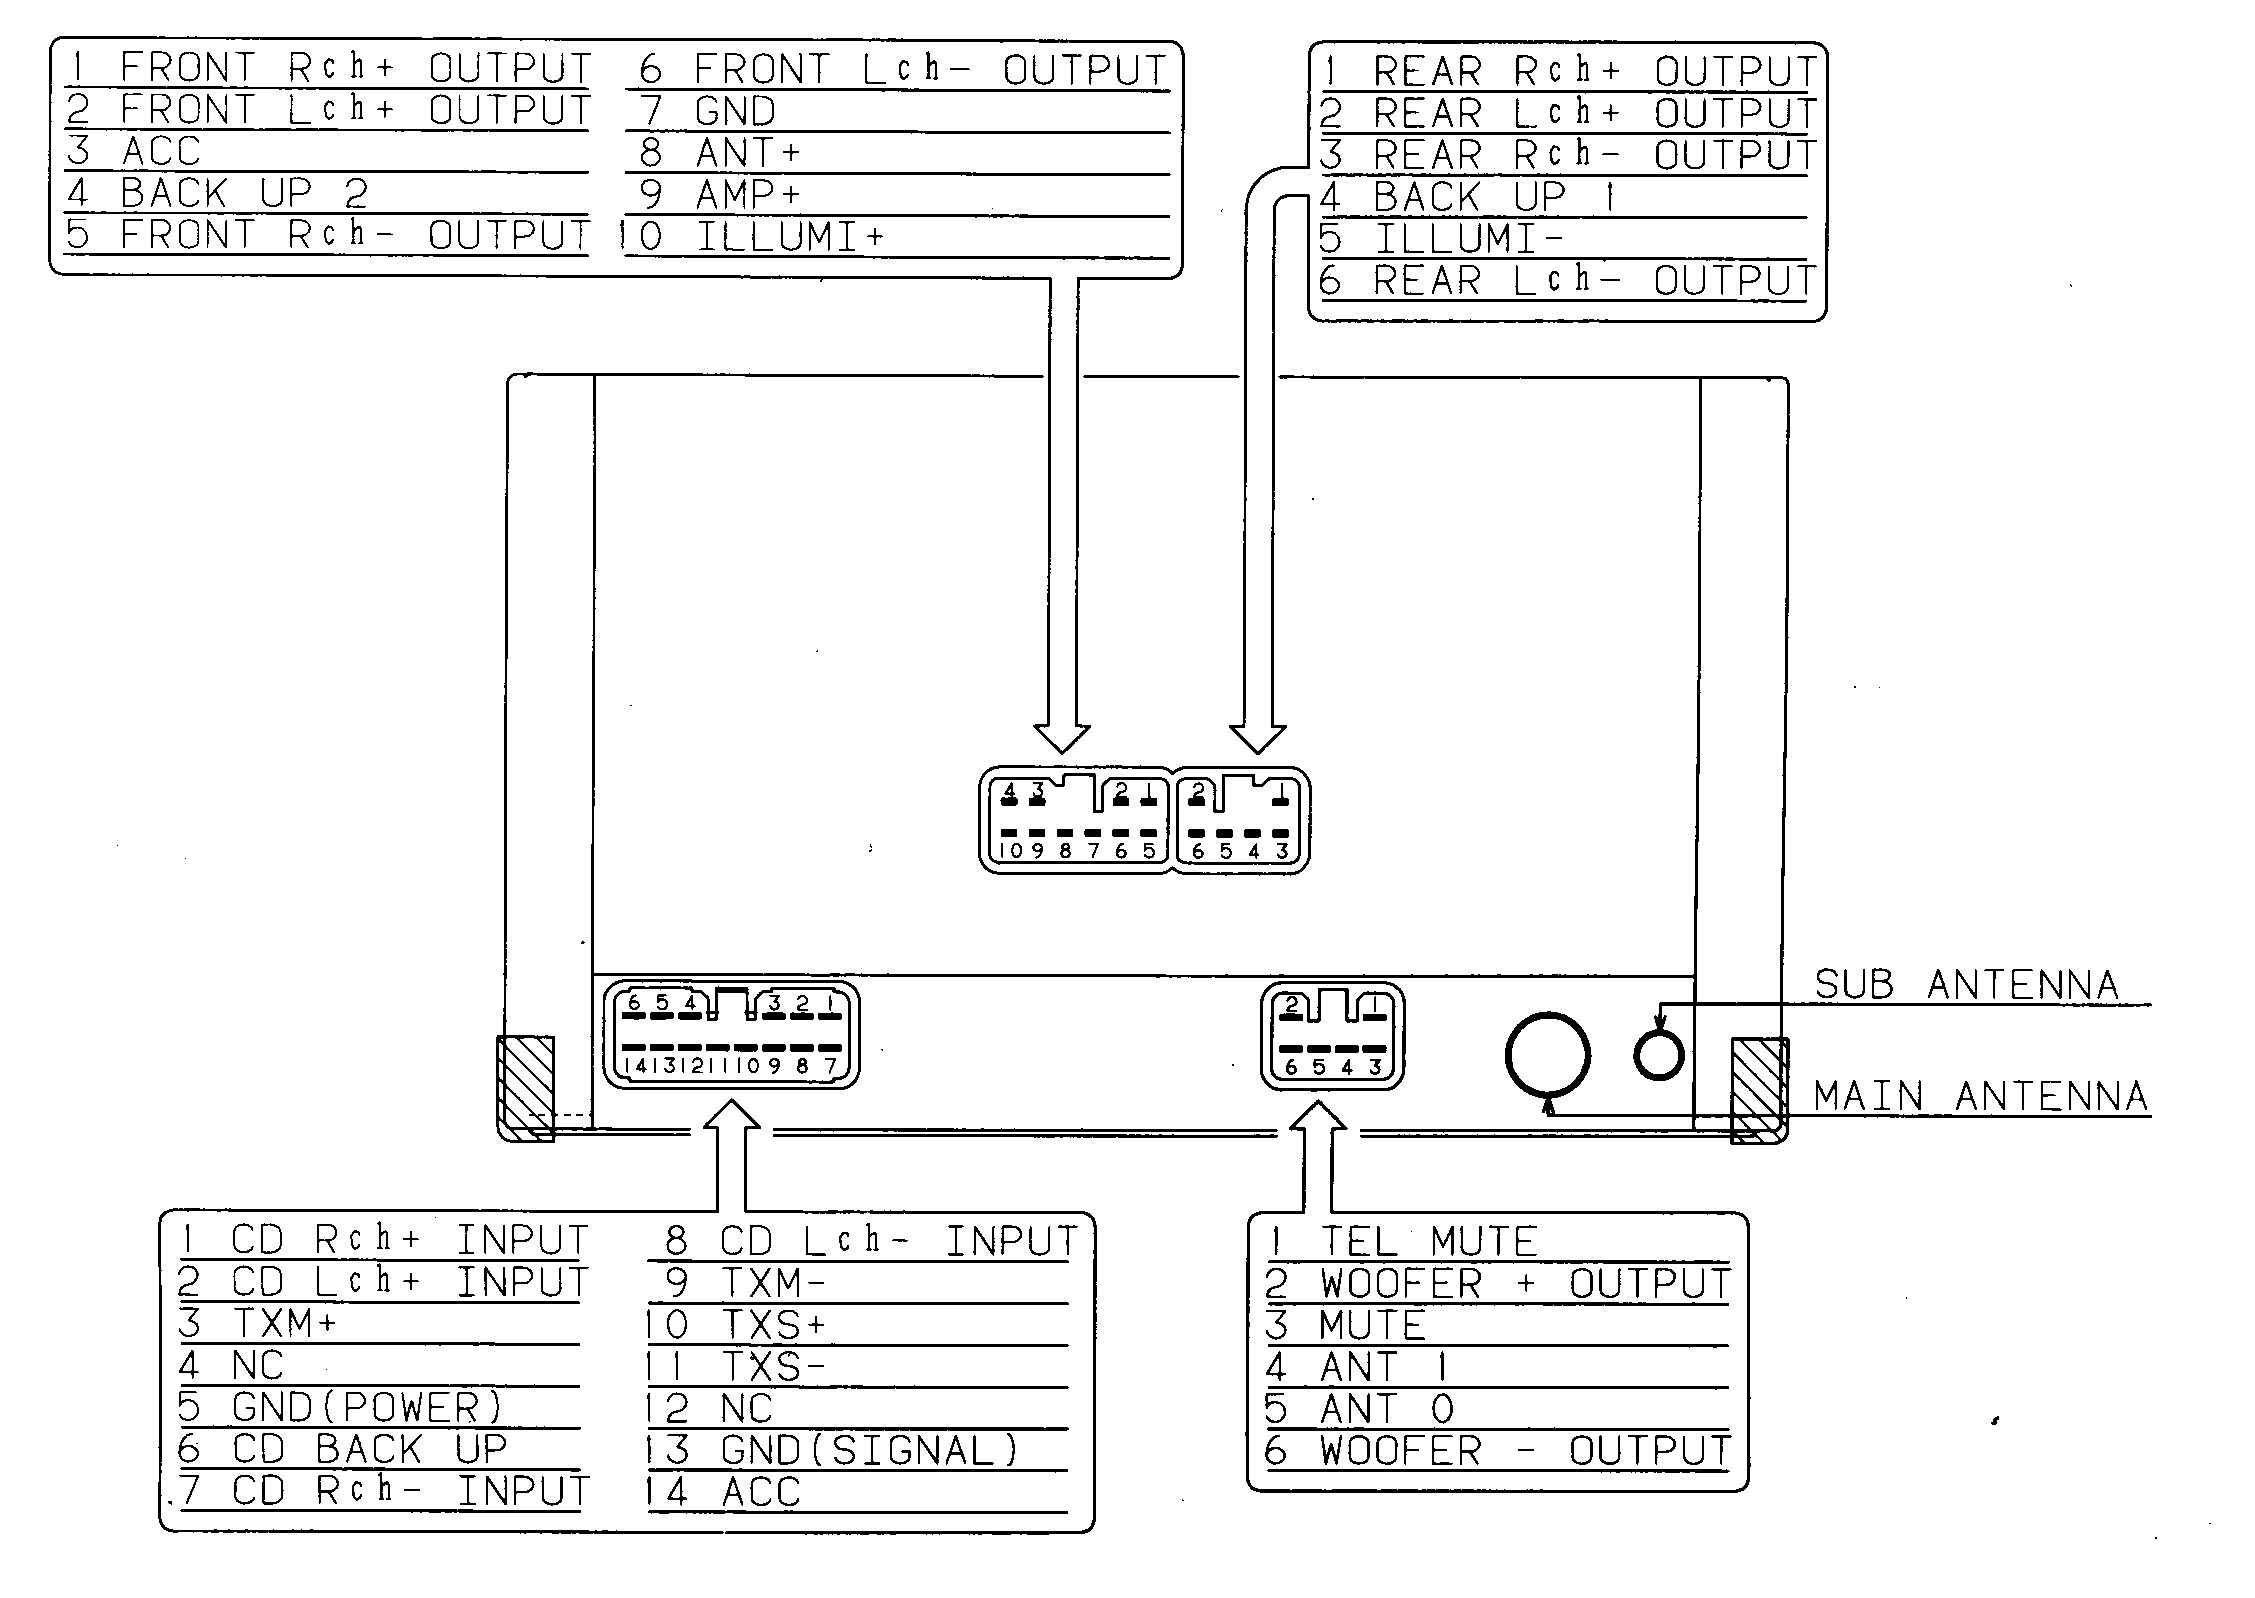 Fujitsu Ten Limited Wiring Diagram In 2021 Sony Car Stereo Car Audio Car Stereo